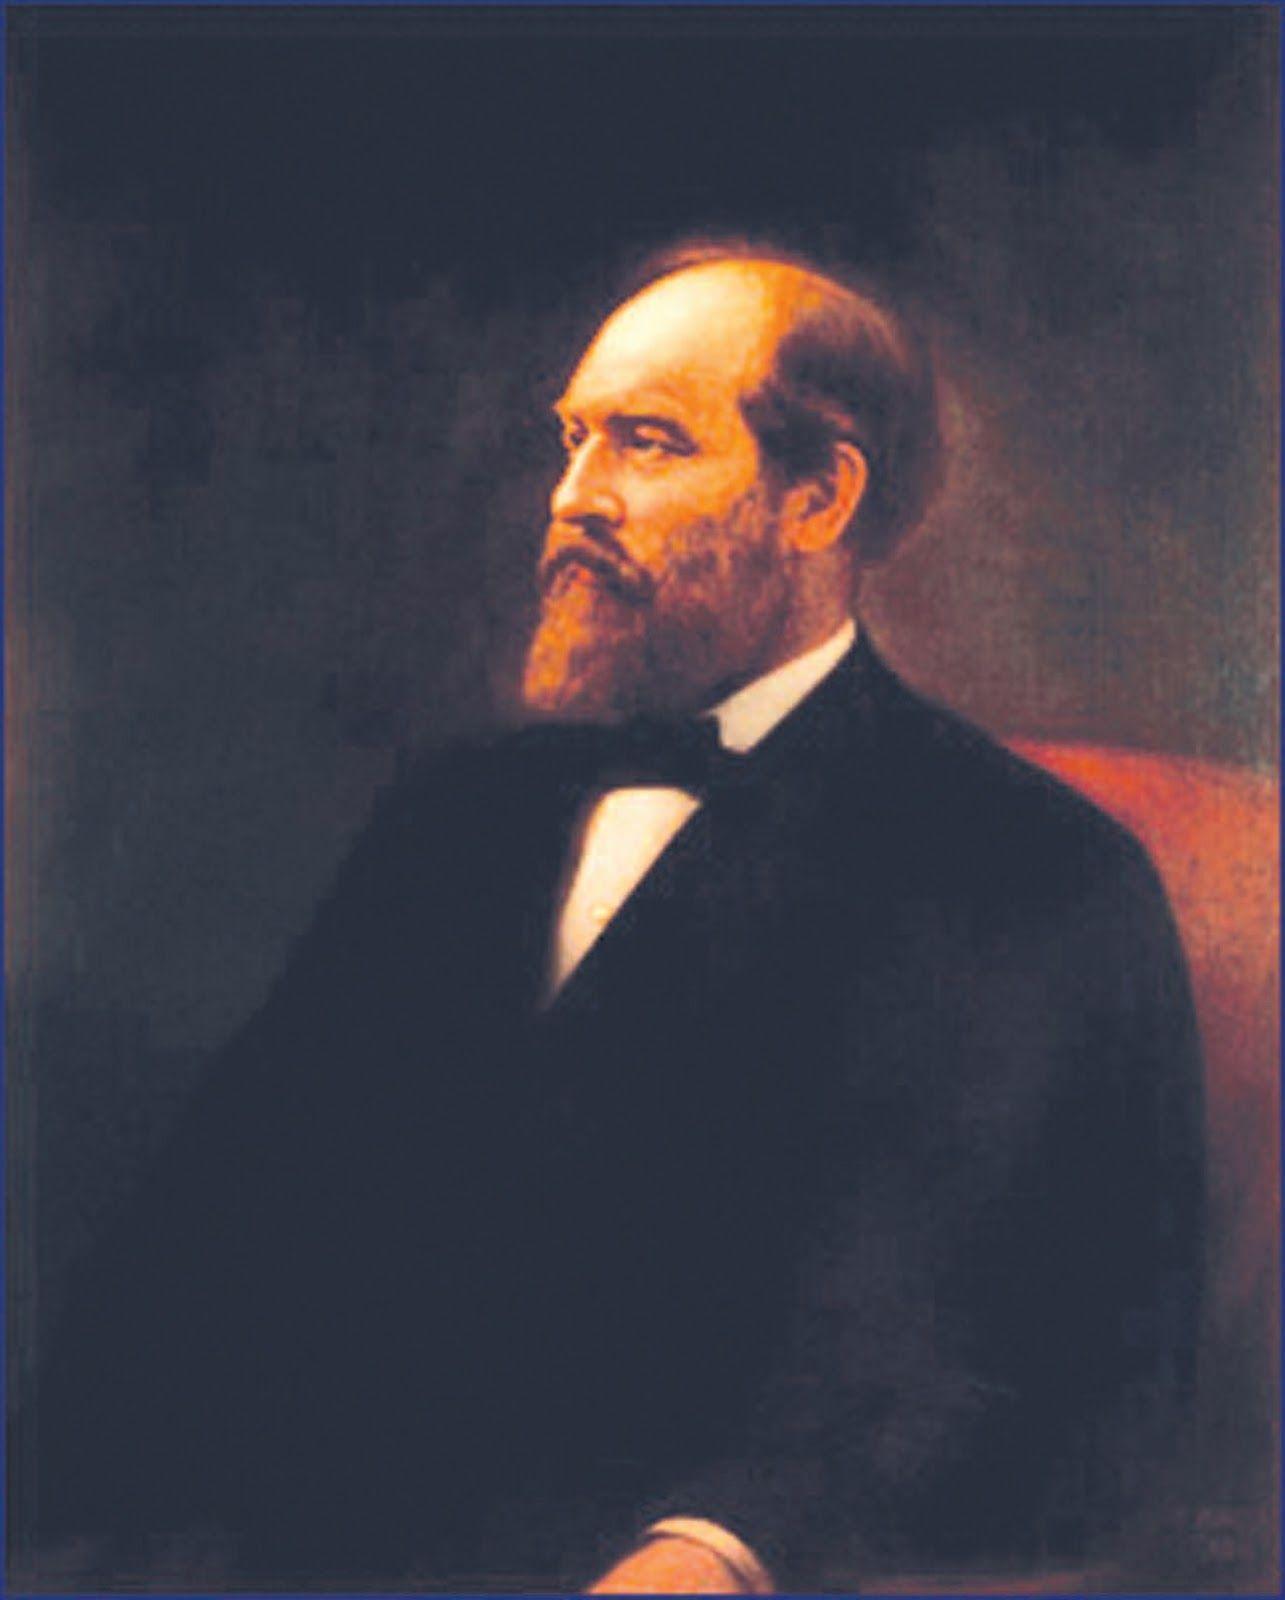 James A Garfield 20th President